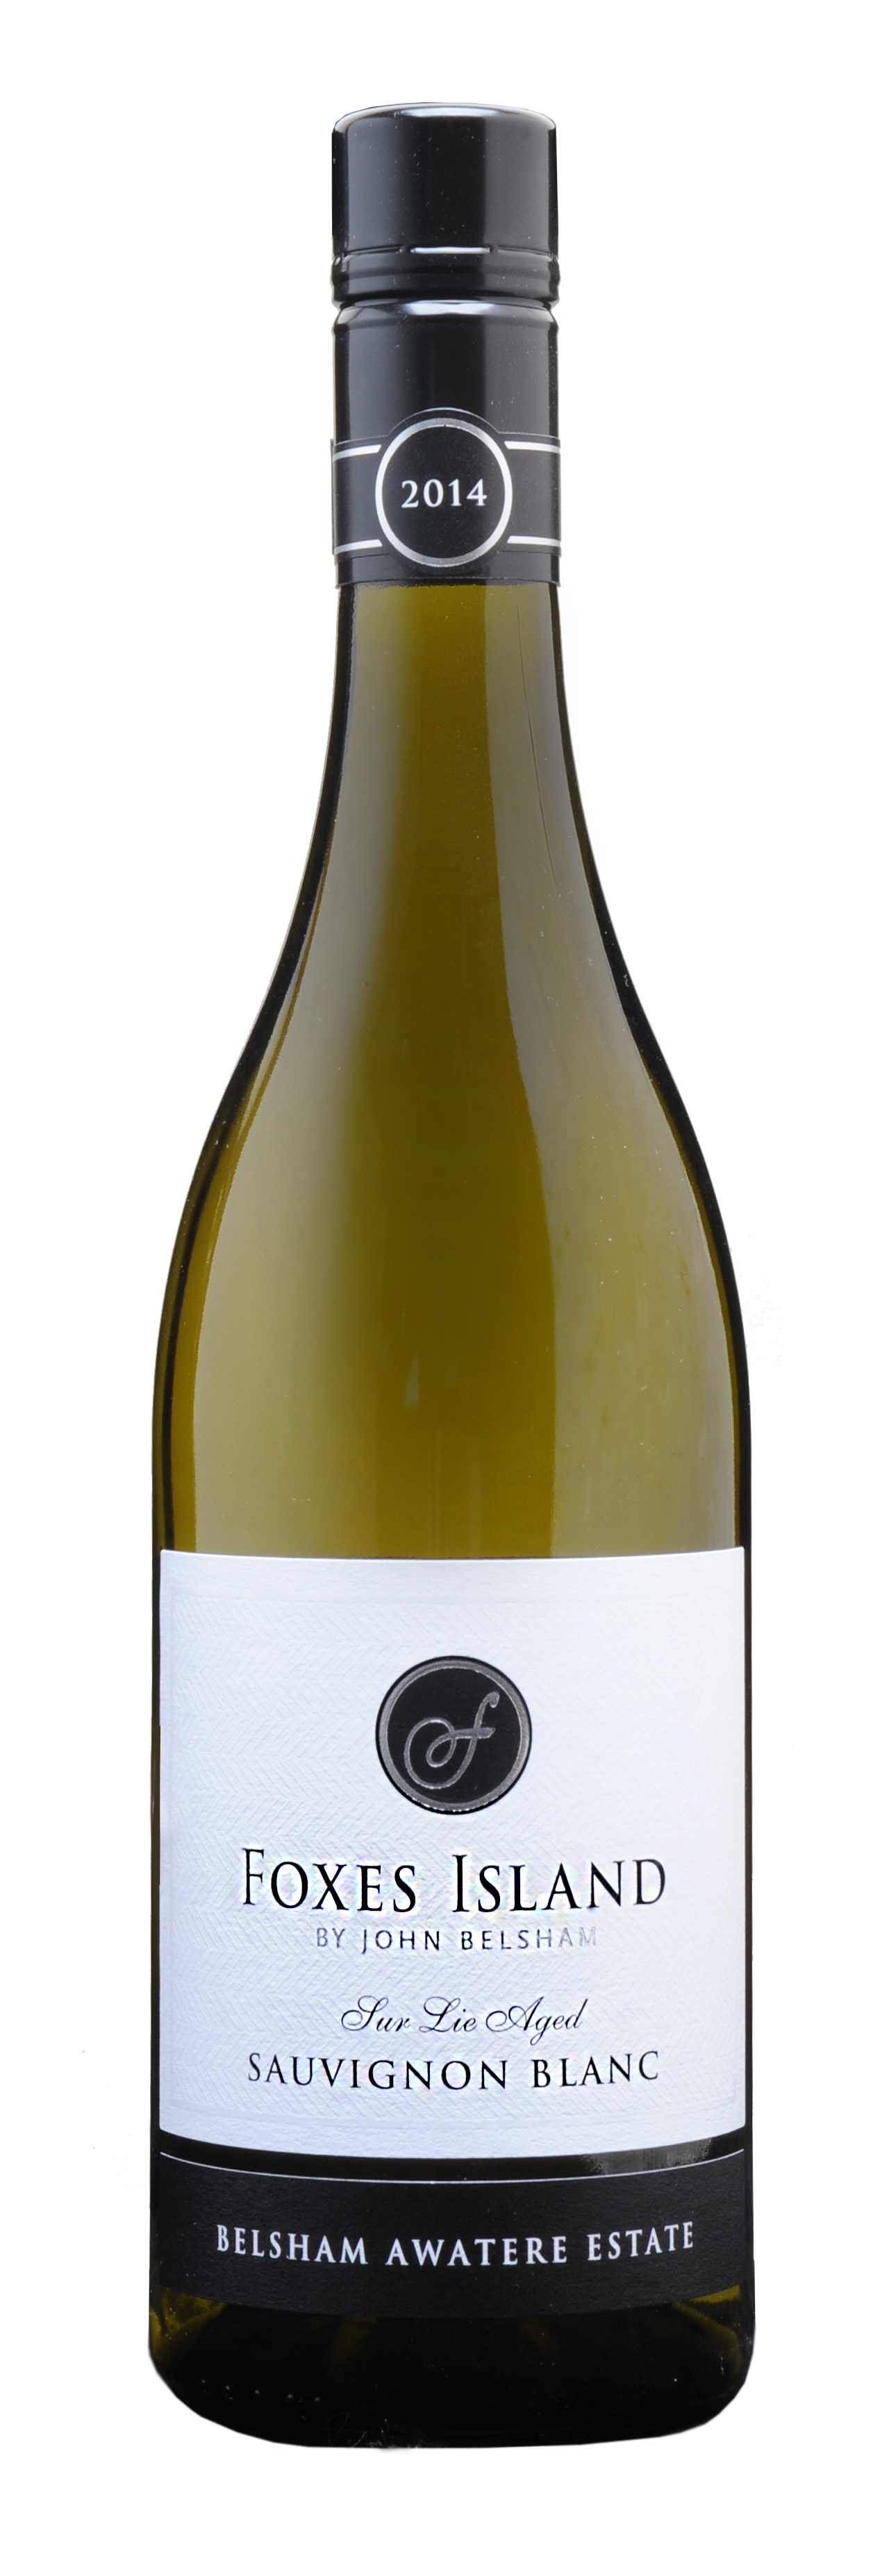 Foxes Island Sur Lie Aged Sauvignon Blanc 2014